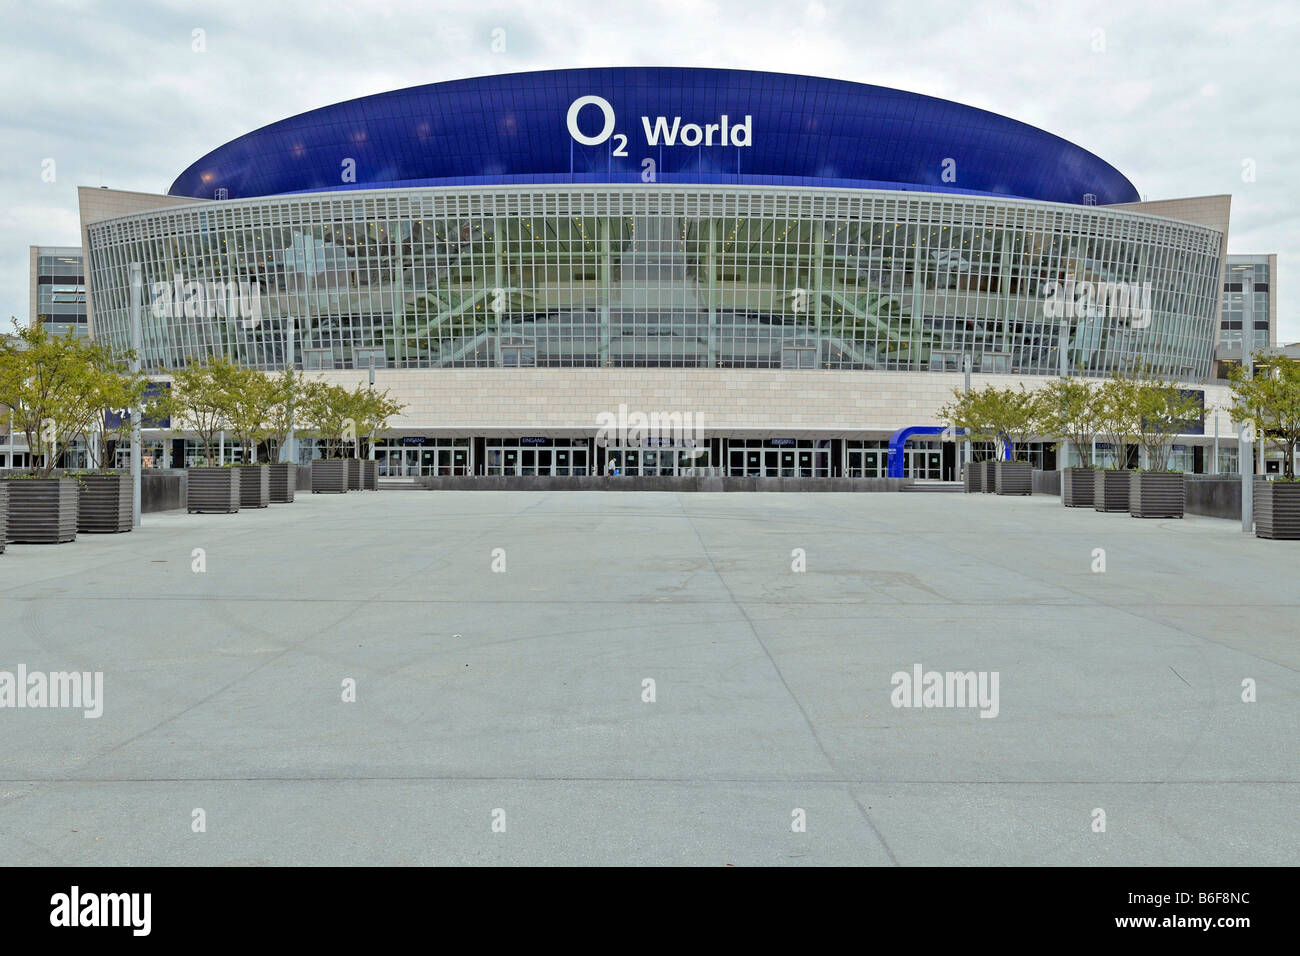 O2 World, Berlin, Germany, Europe - Stock Image